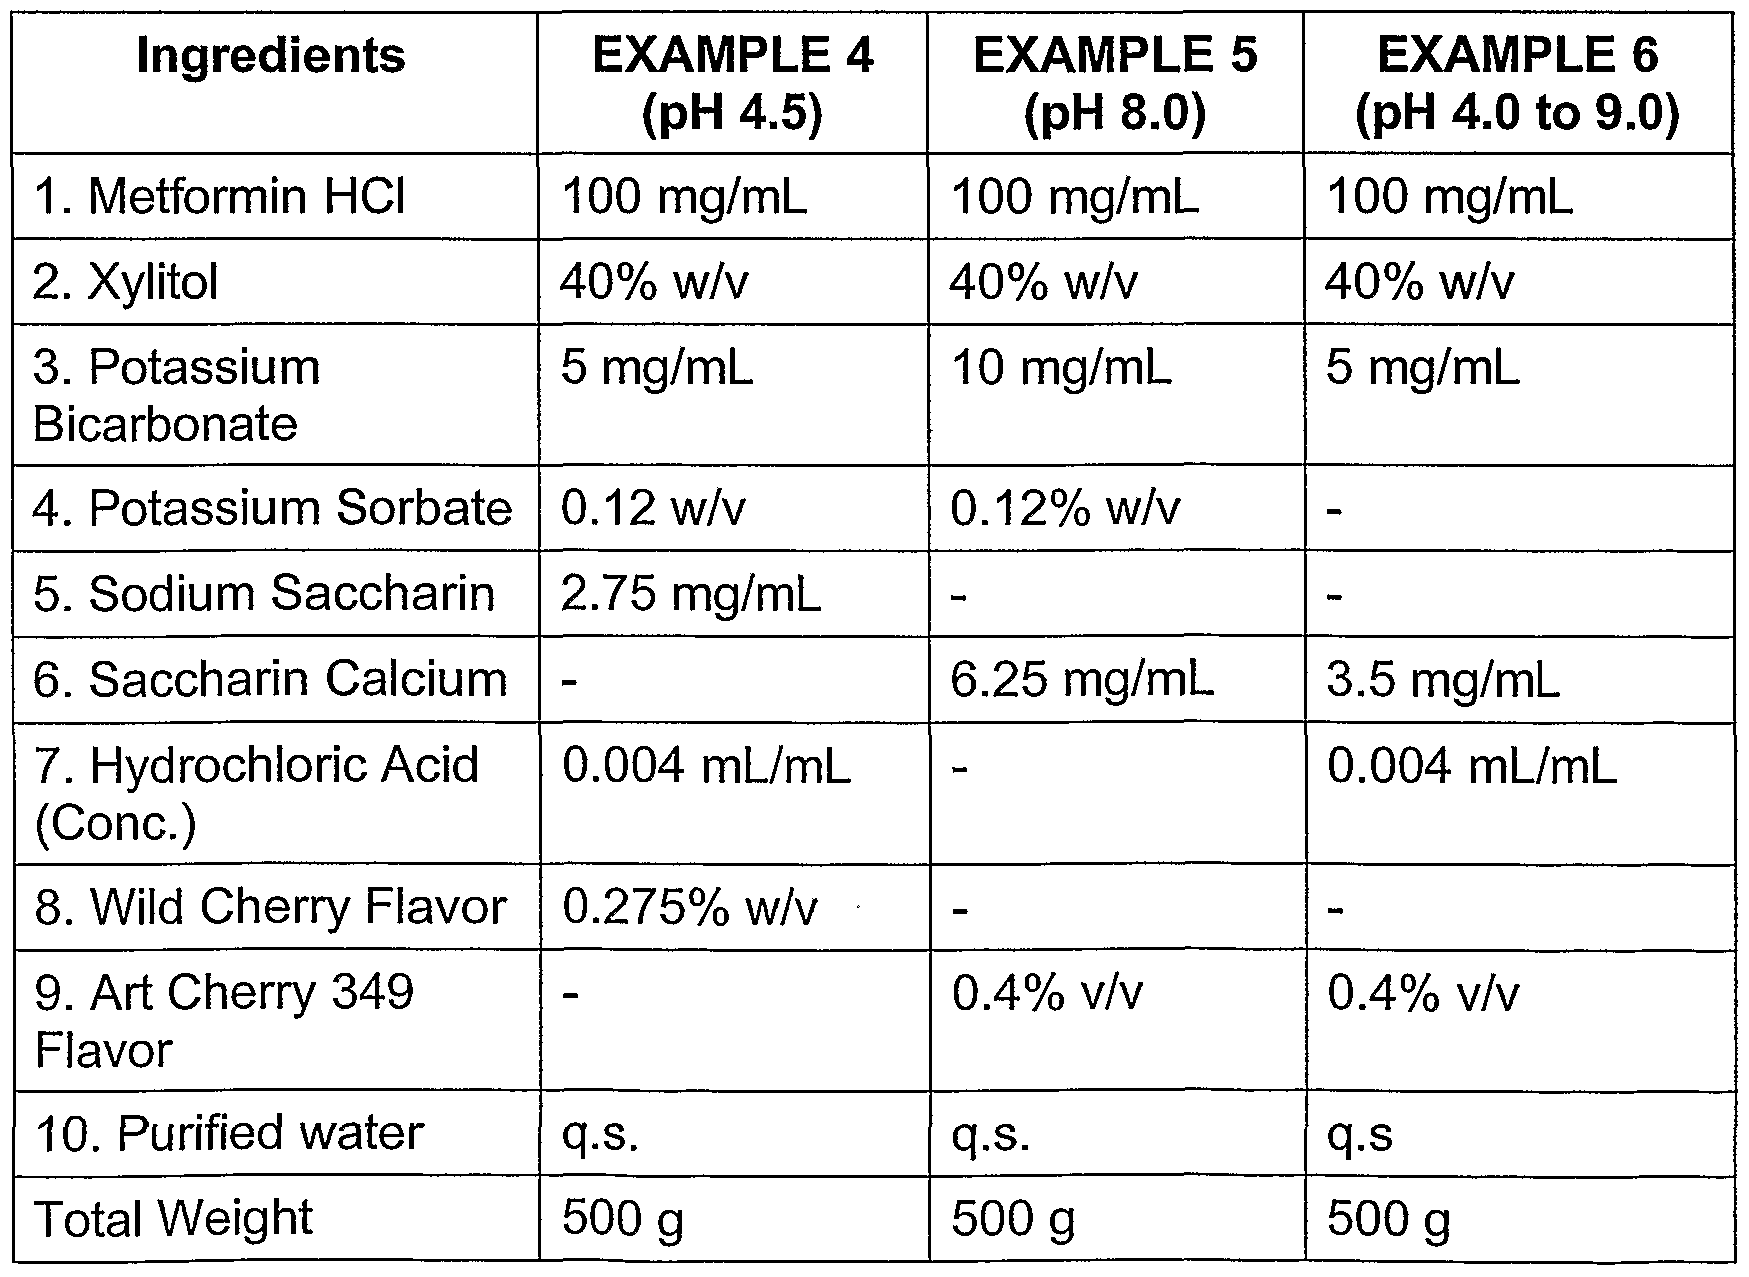 Glucophage 1000 mg tab.doc - Figure Imgf000030_0001